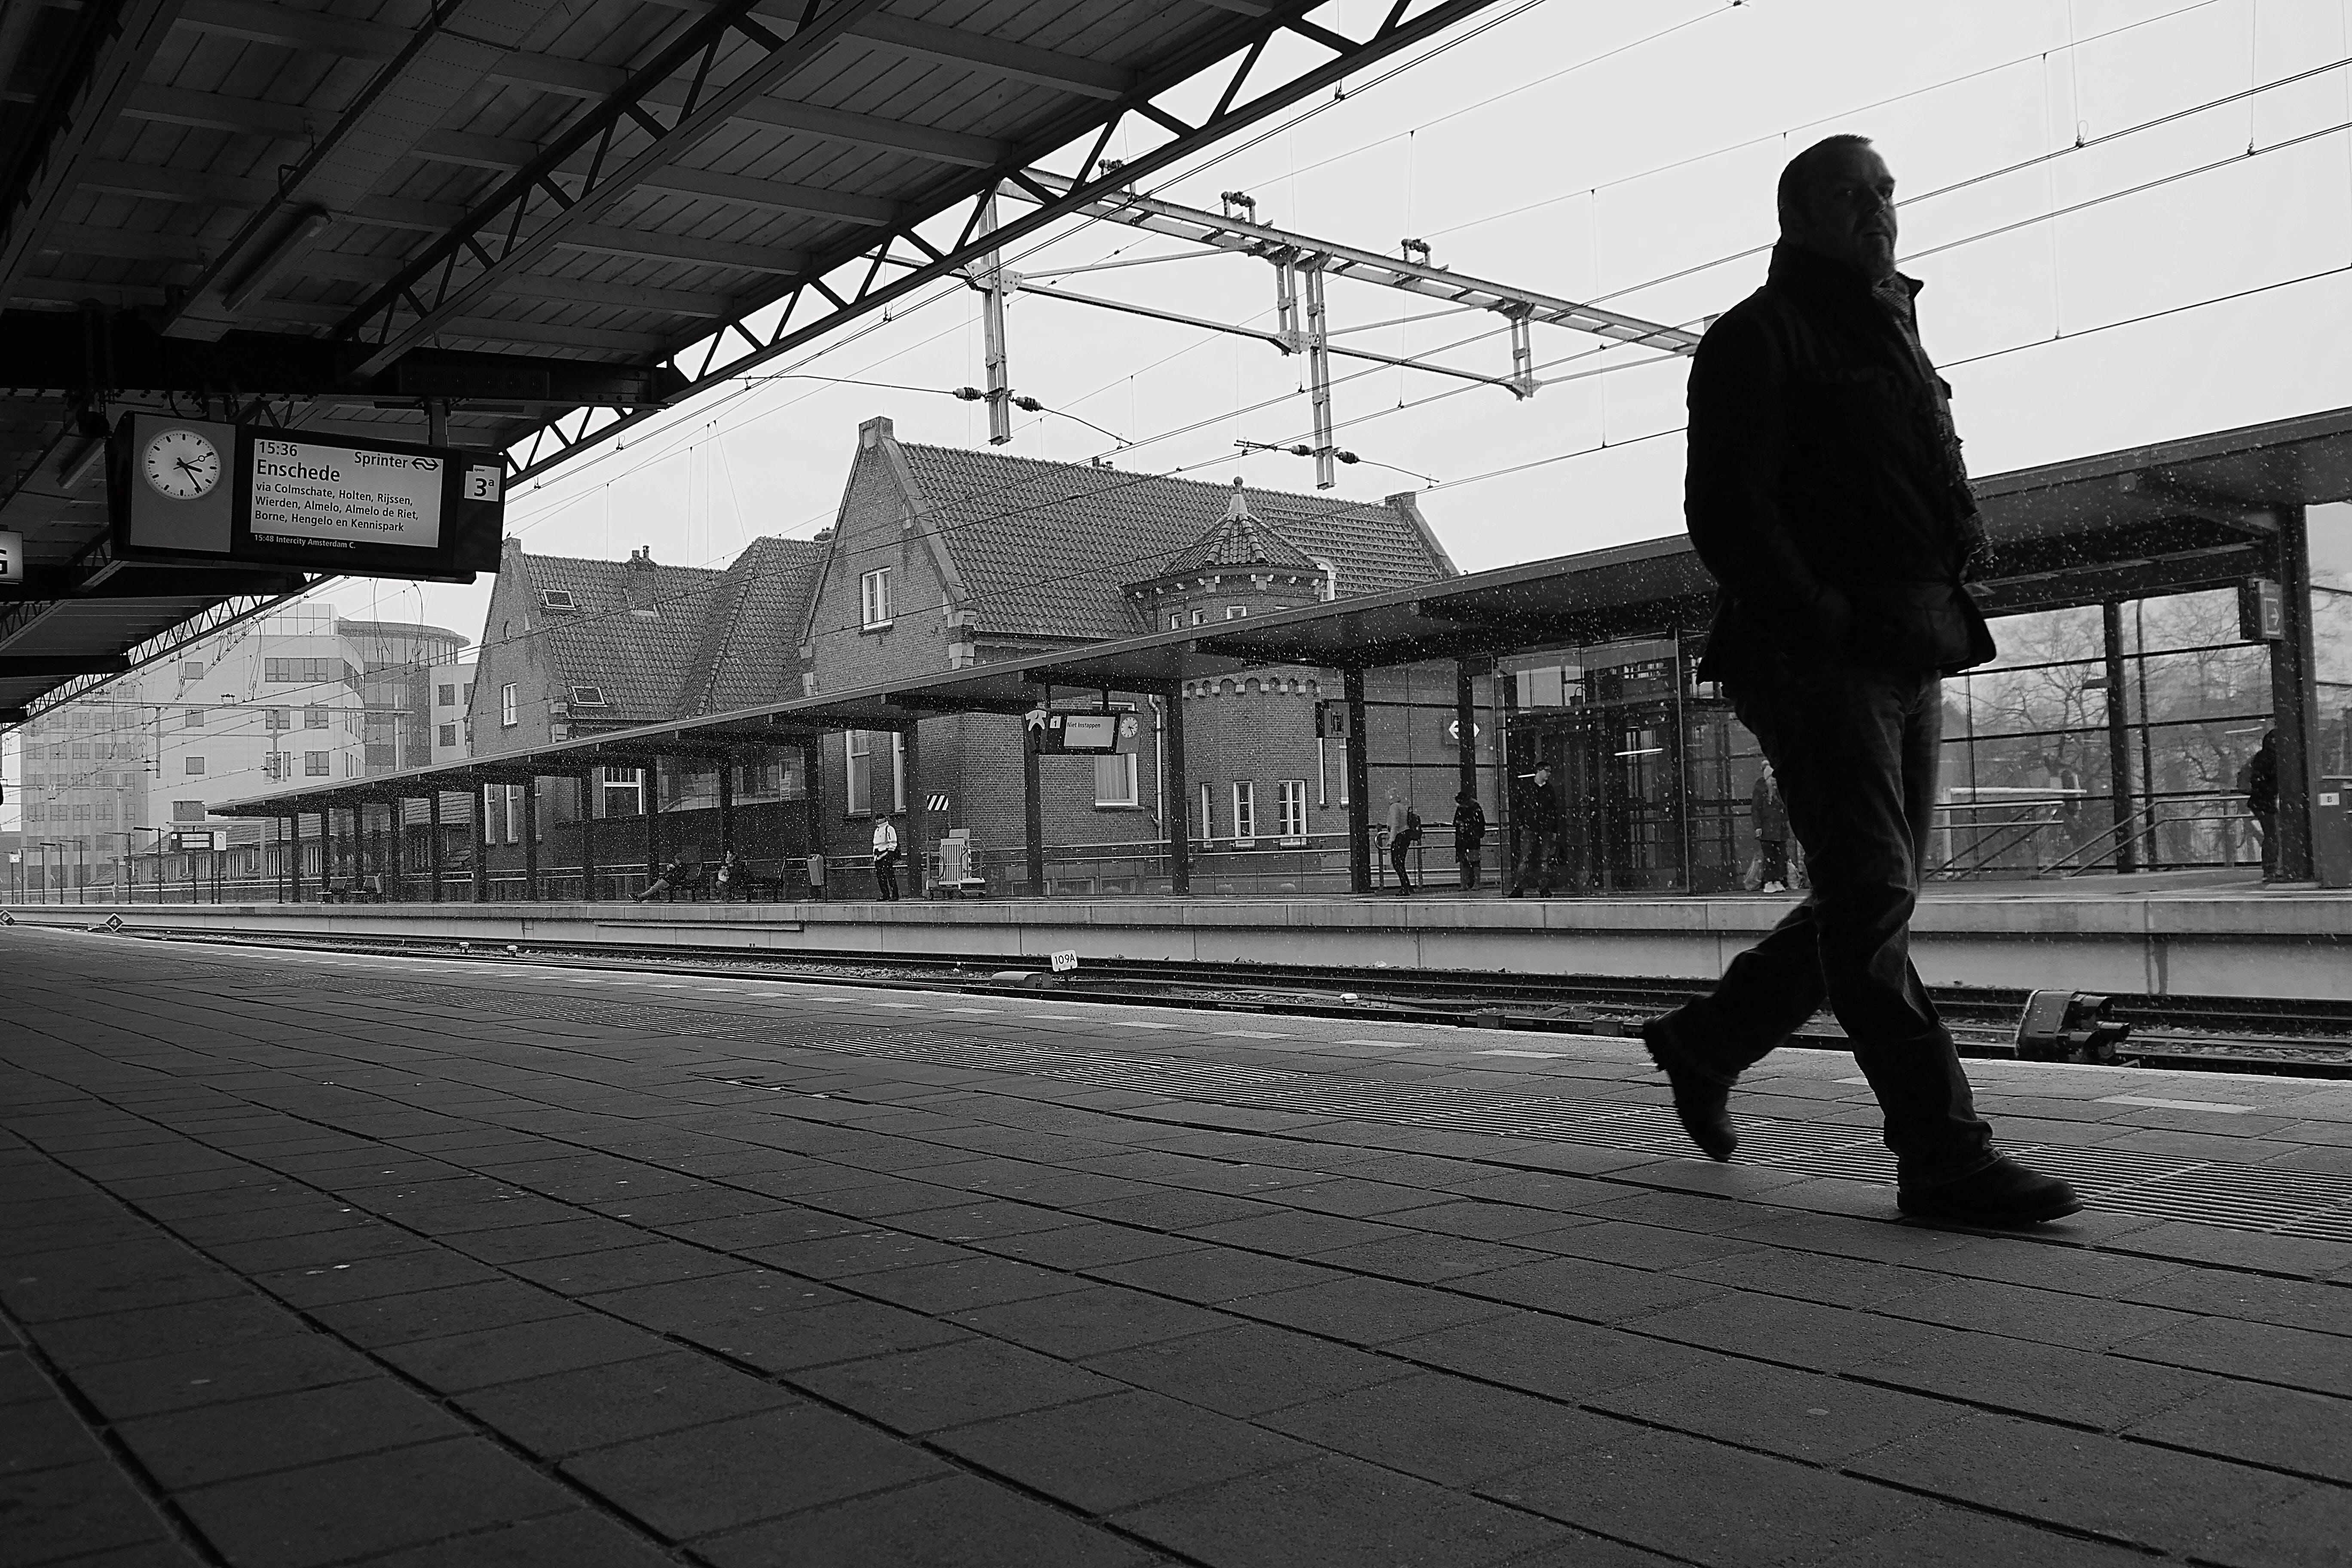 Grayscale Photo of Man Walking on Train Platform